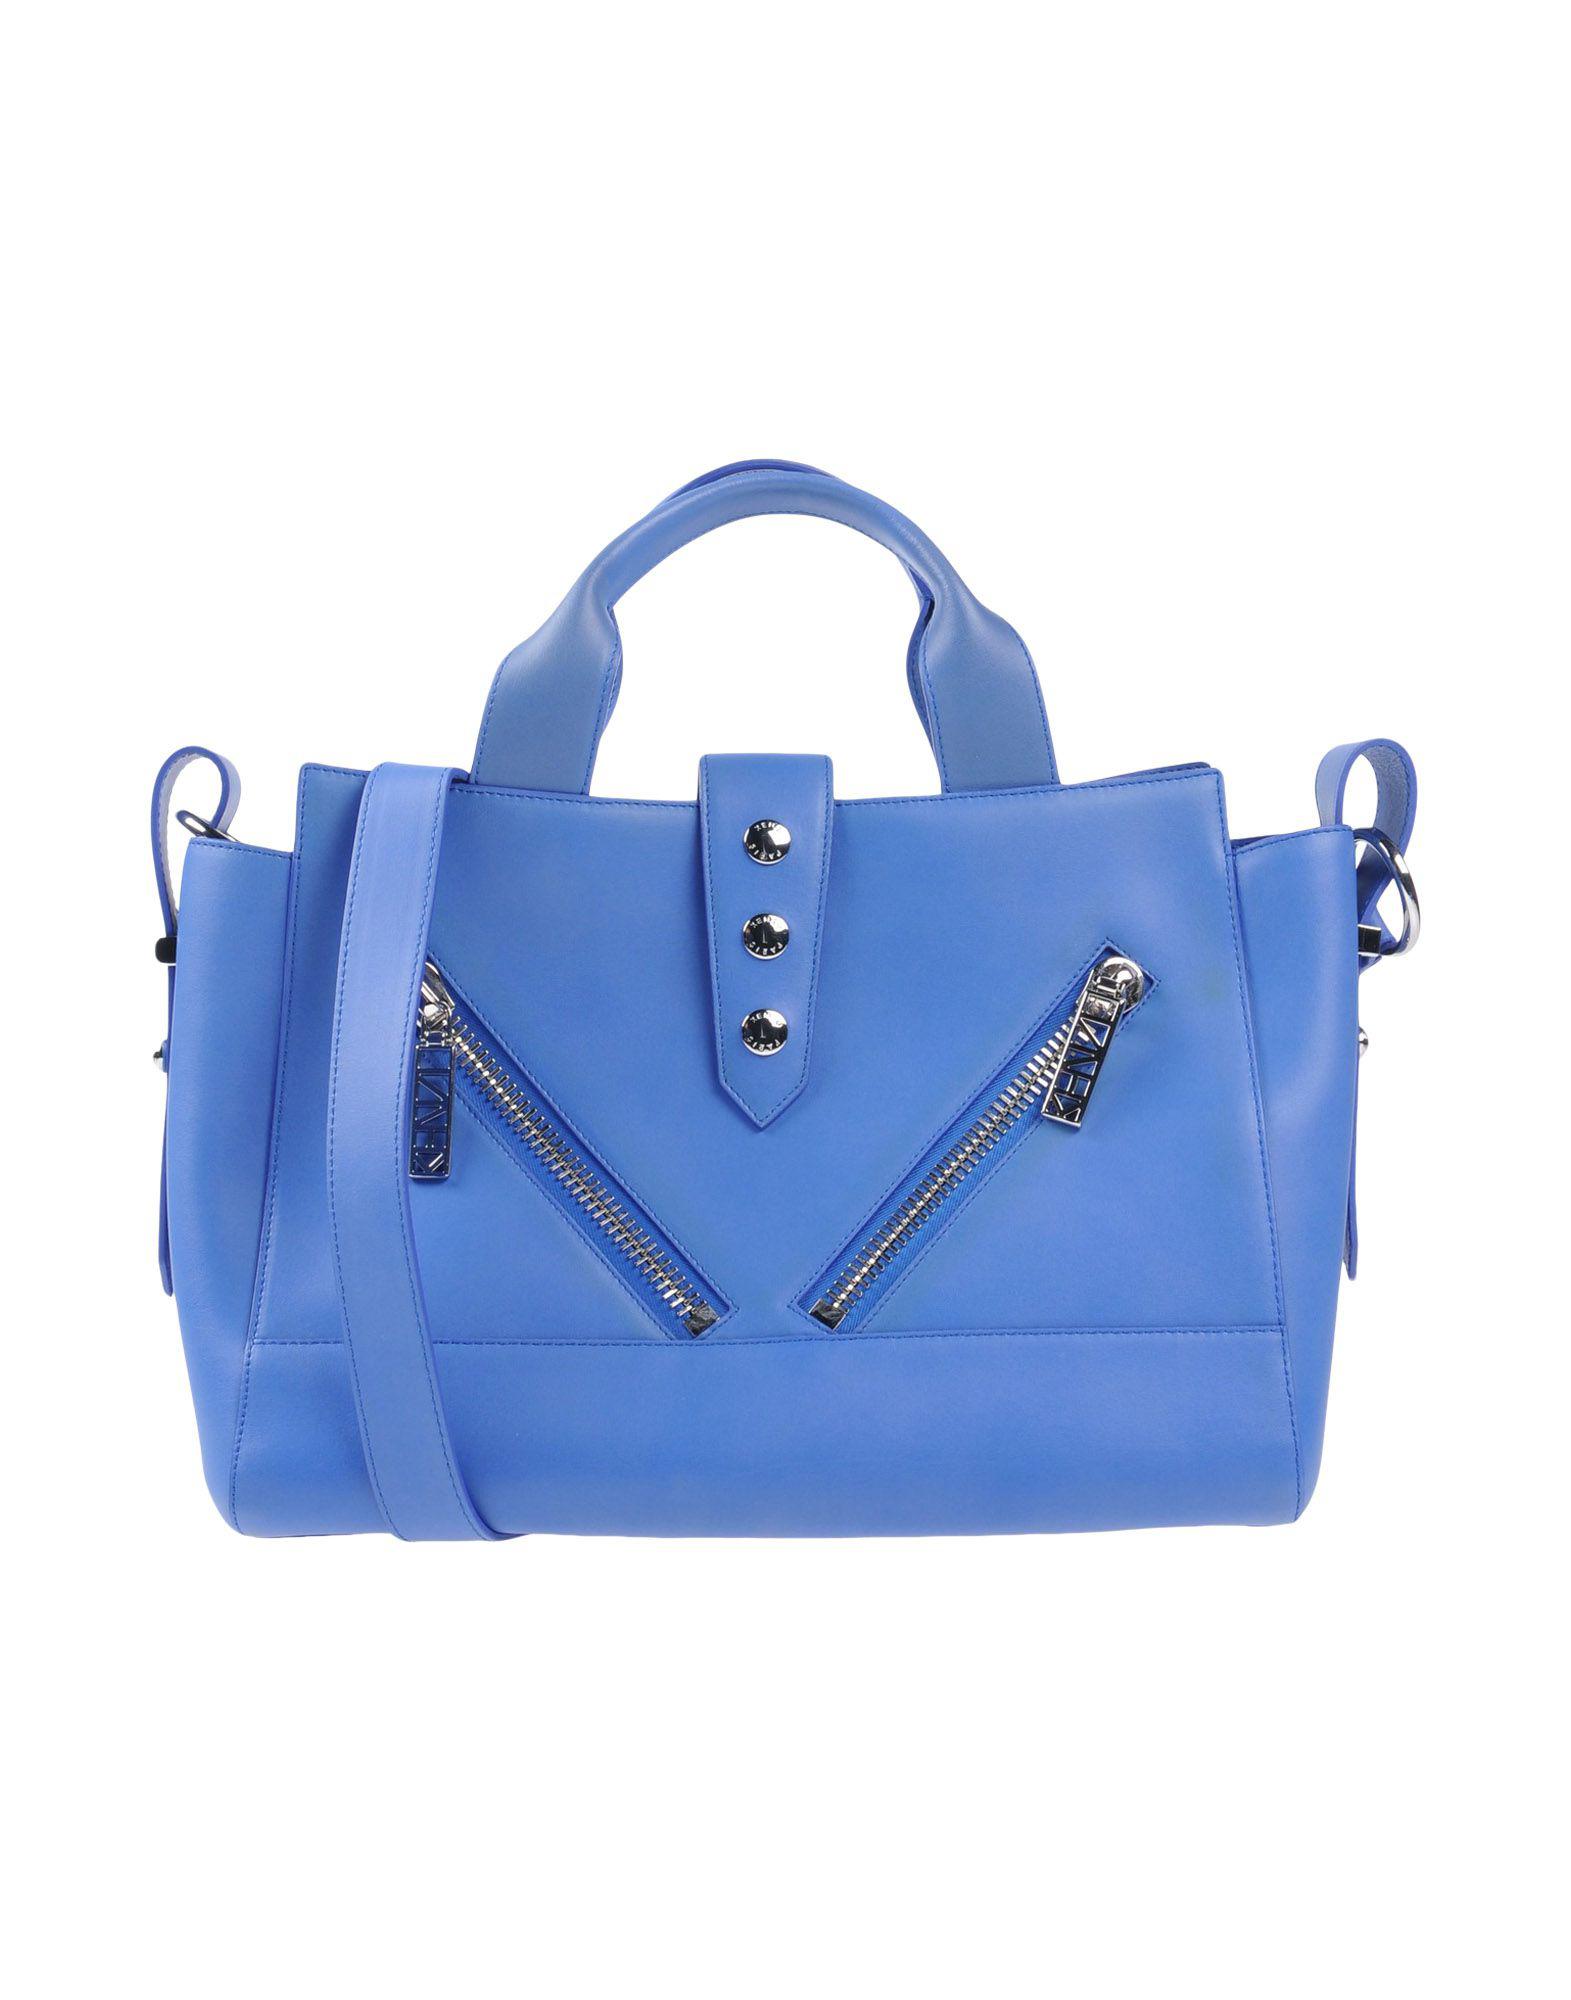 Kenzo Handbags In Blue